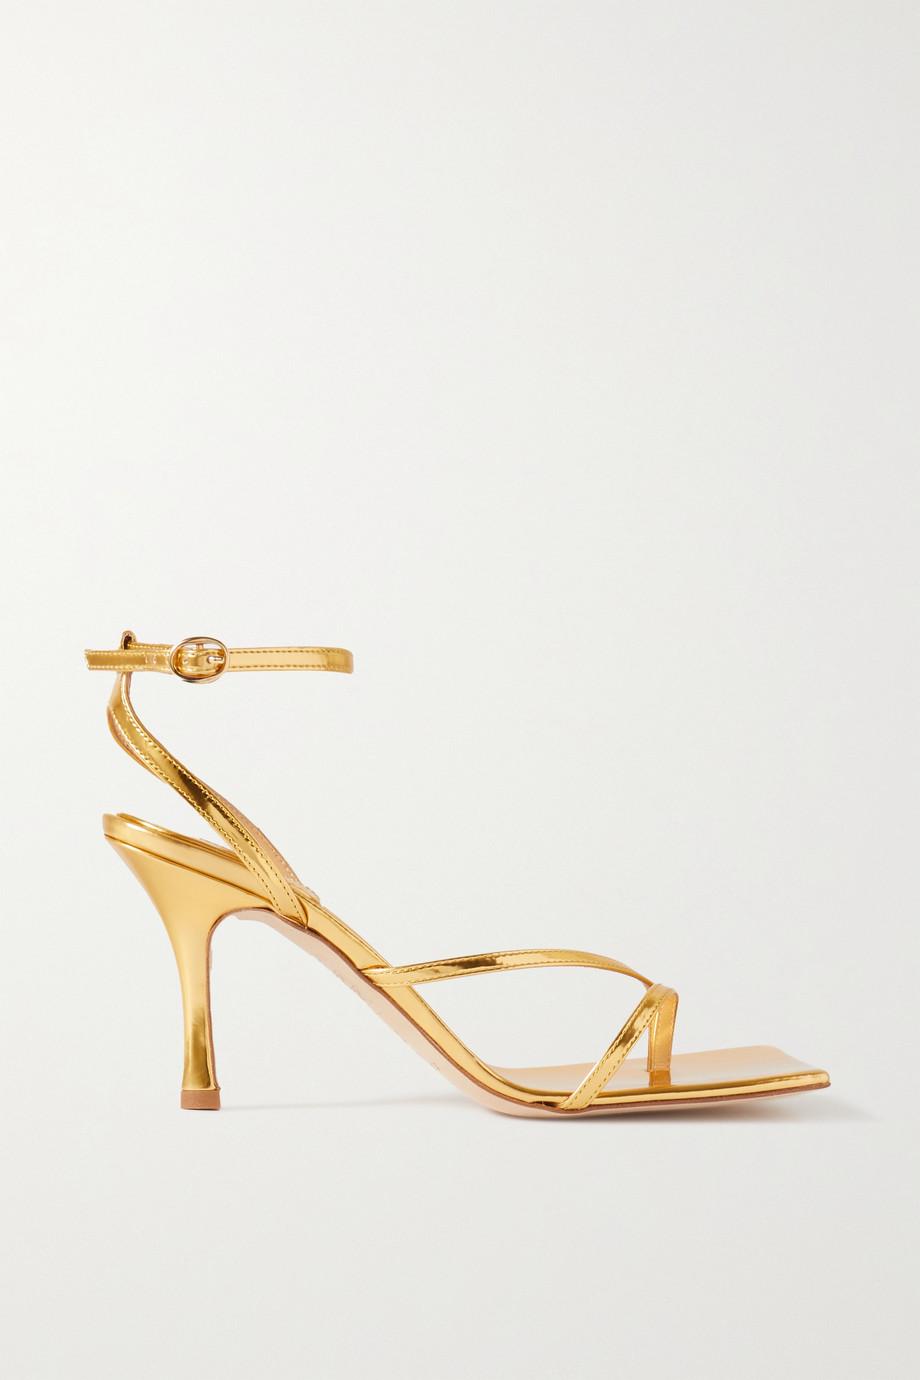 A.W.A.K.E. MODE Delta metallic leather sandals